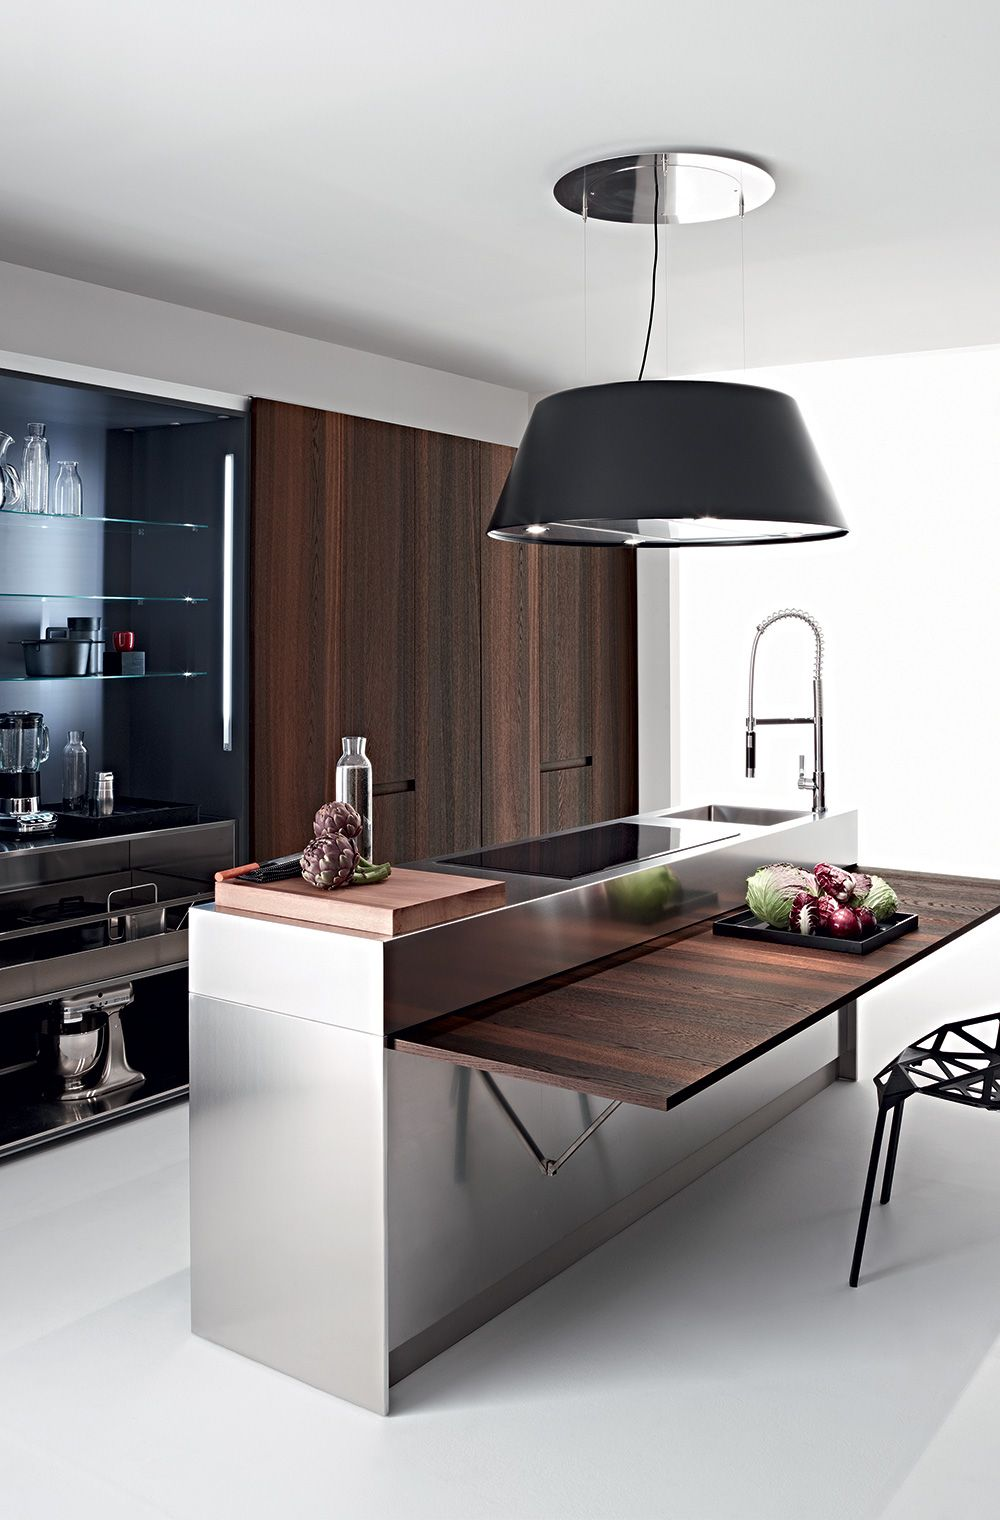 Slim Wing Table Elmar Cucine Design Cucine Arredo Interni Cucina Cucine Di Lusso